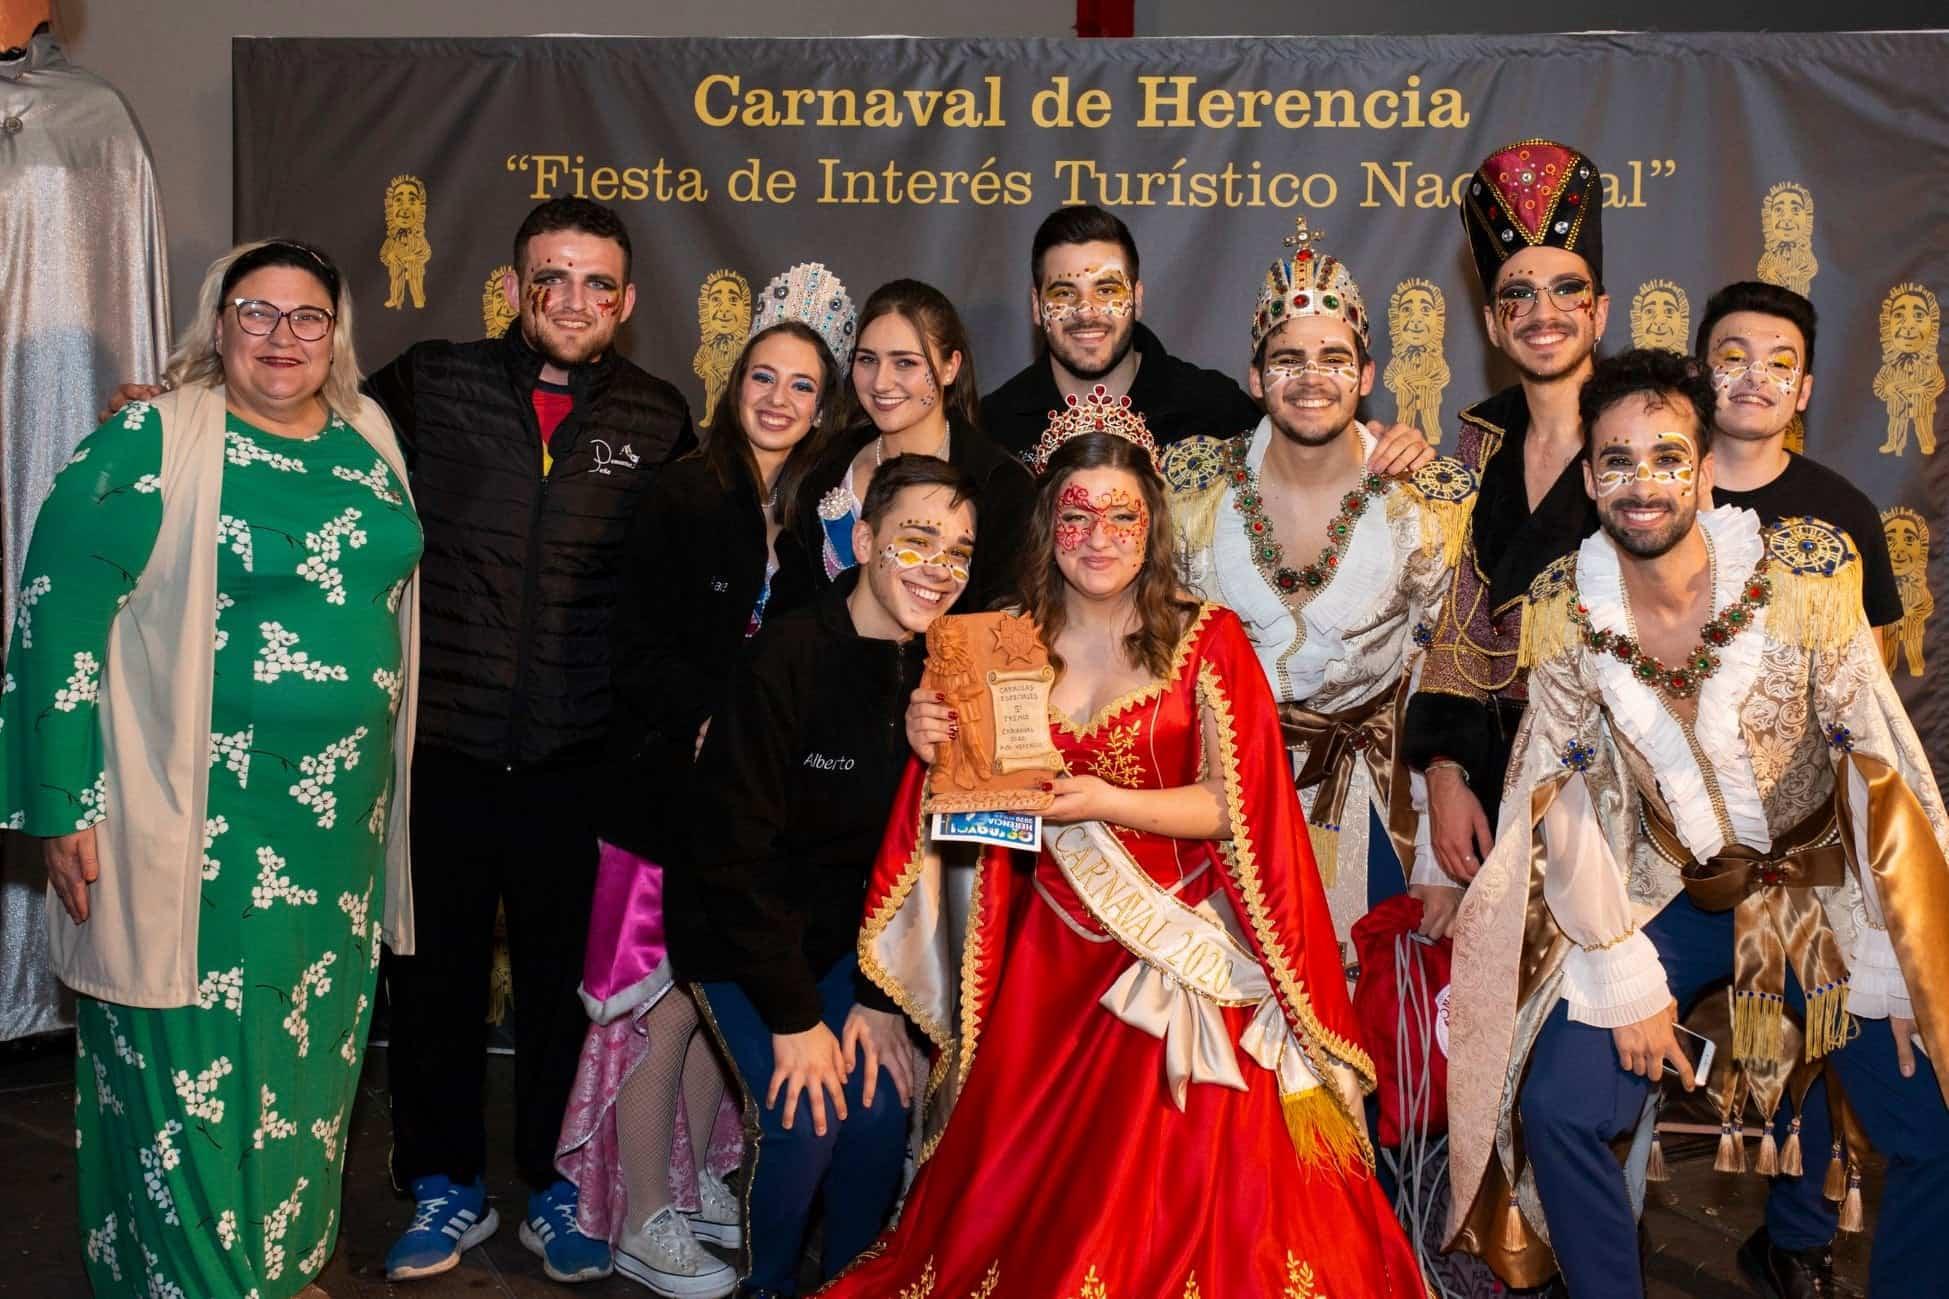 Carnaval de herencia 2020 ofertorio 129 - Selección de fotografías del Ofertorio del Carnaval de Herencia